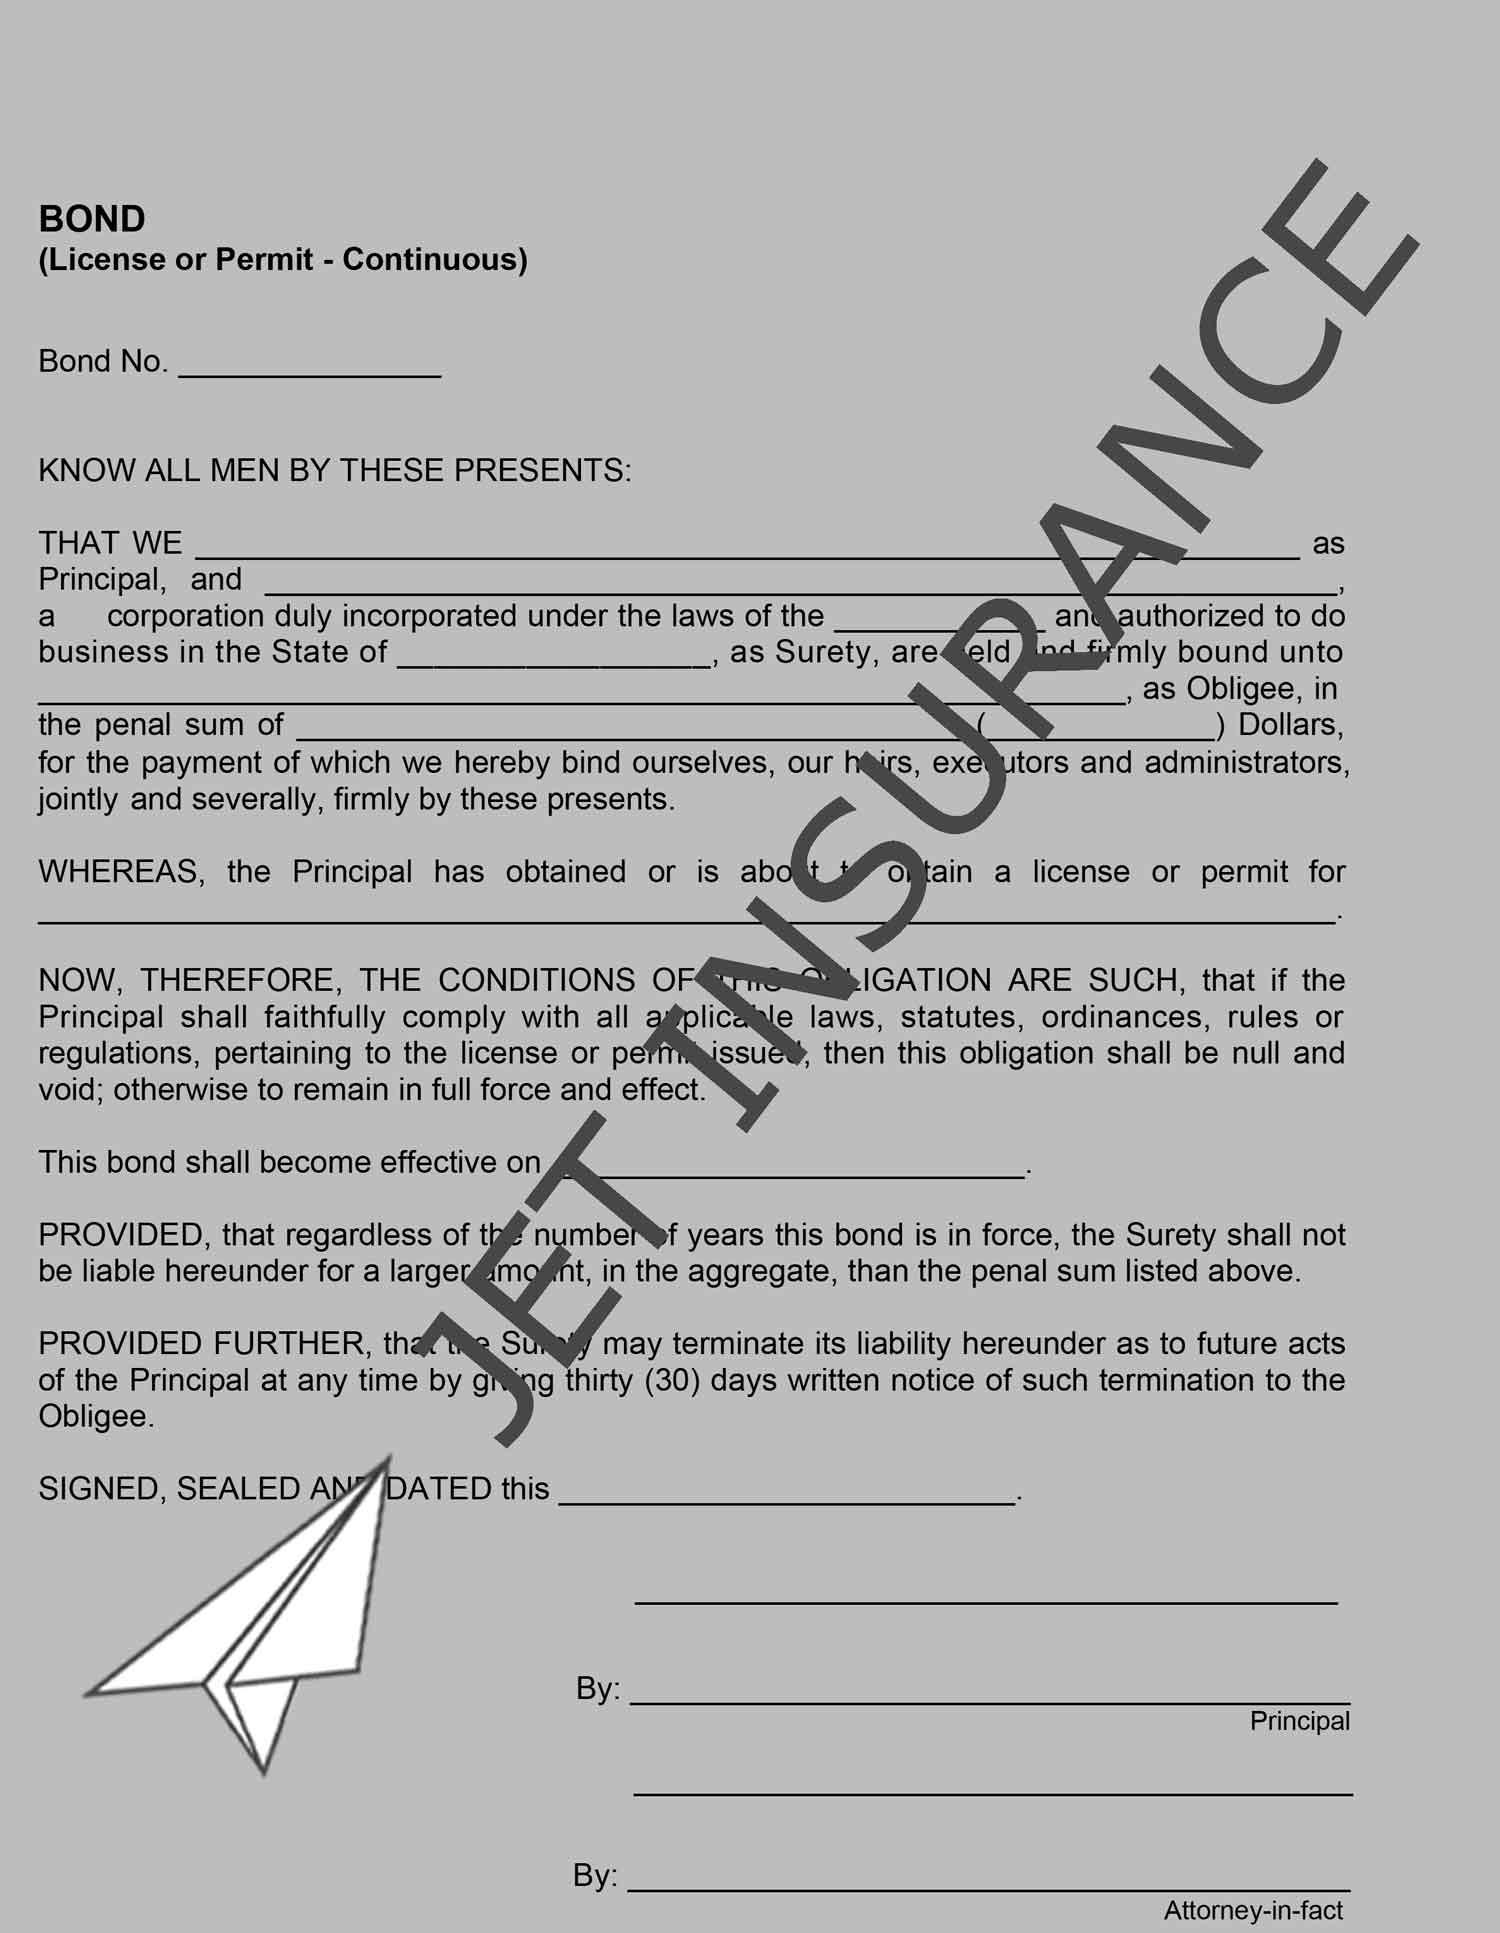 Nevada Auctioneer Bond Form